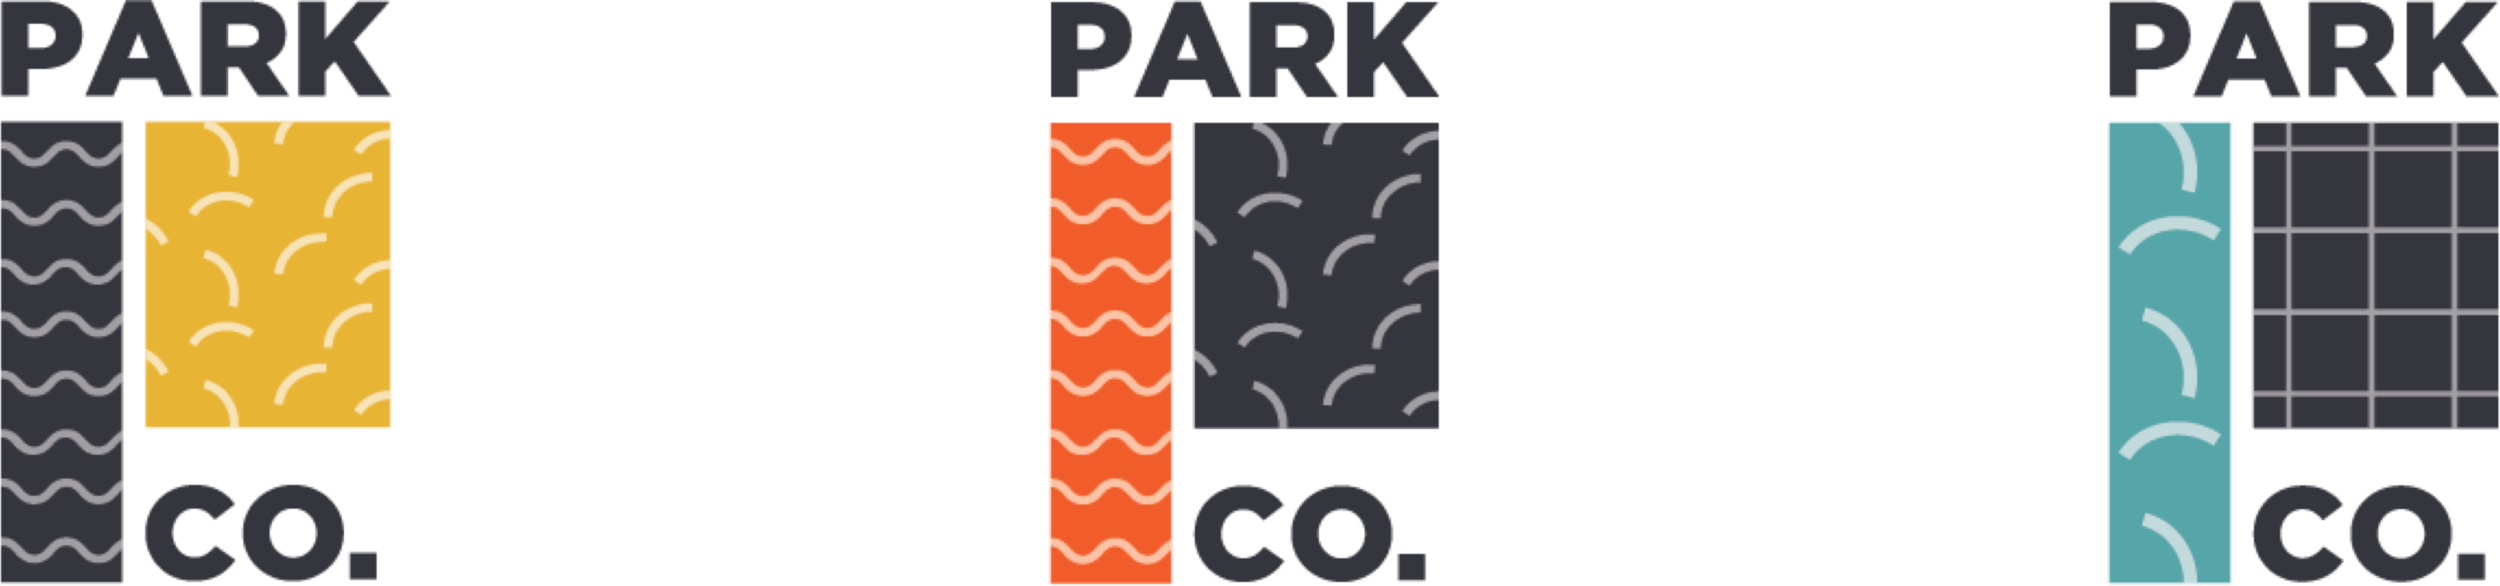 flex-logos.png